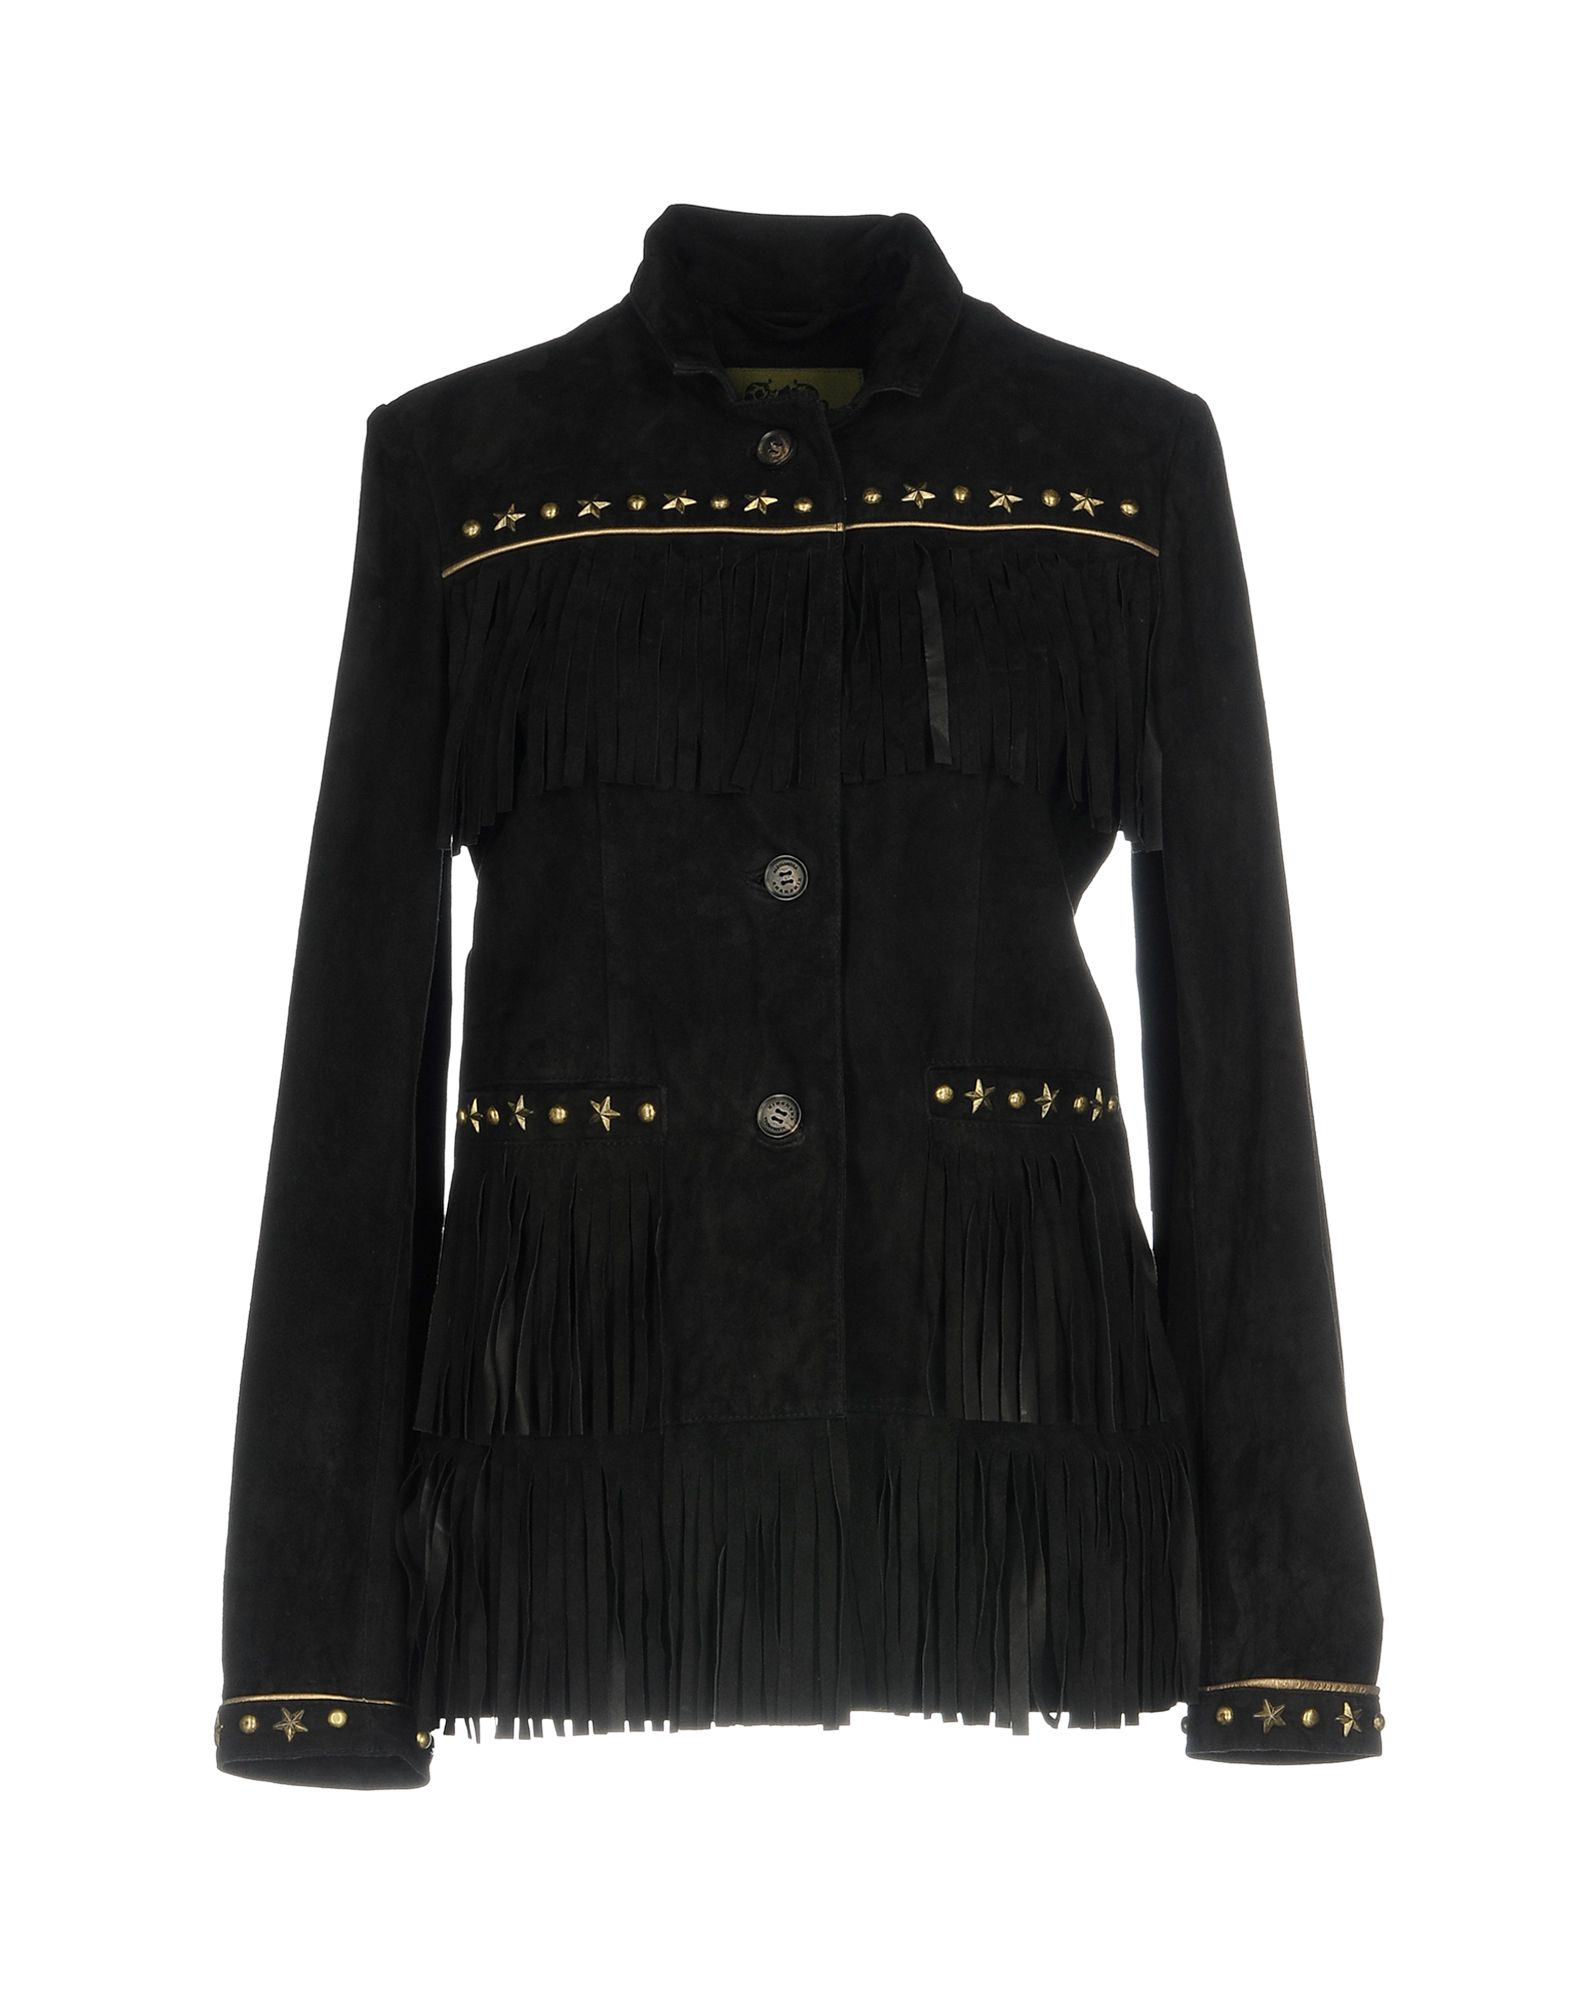 CHAMONIX Leather Jacket in Black